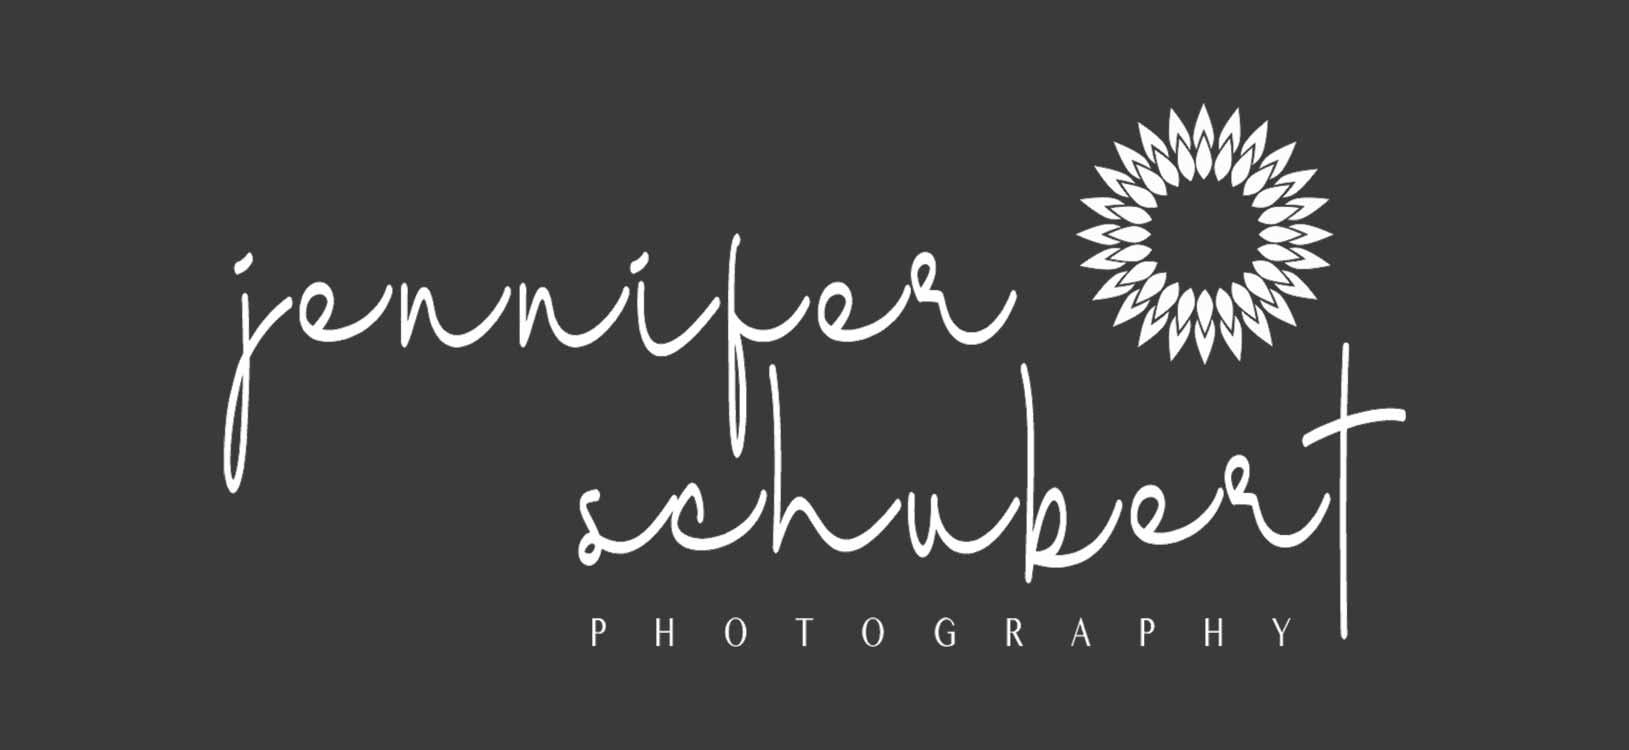 Jennifer Schubert Photography